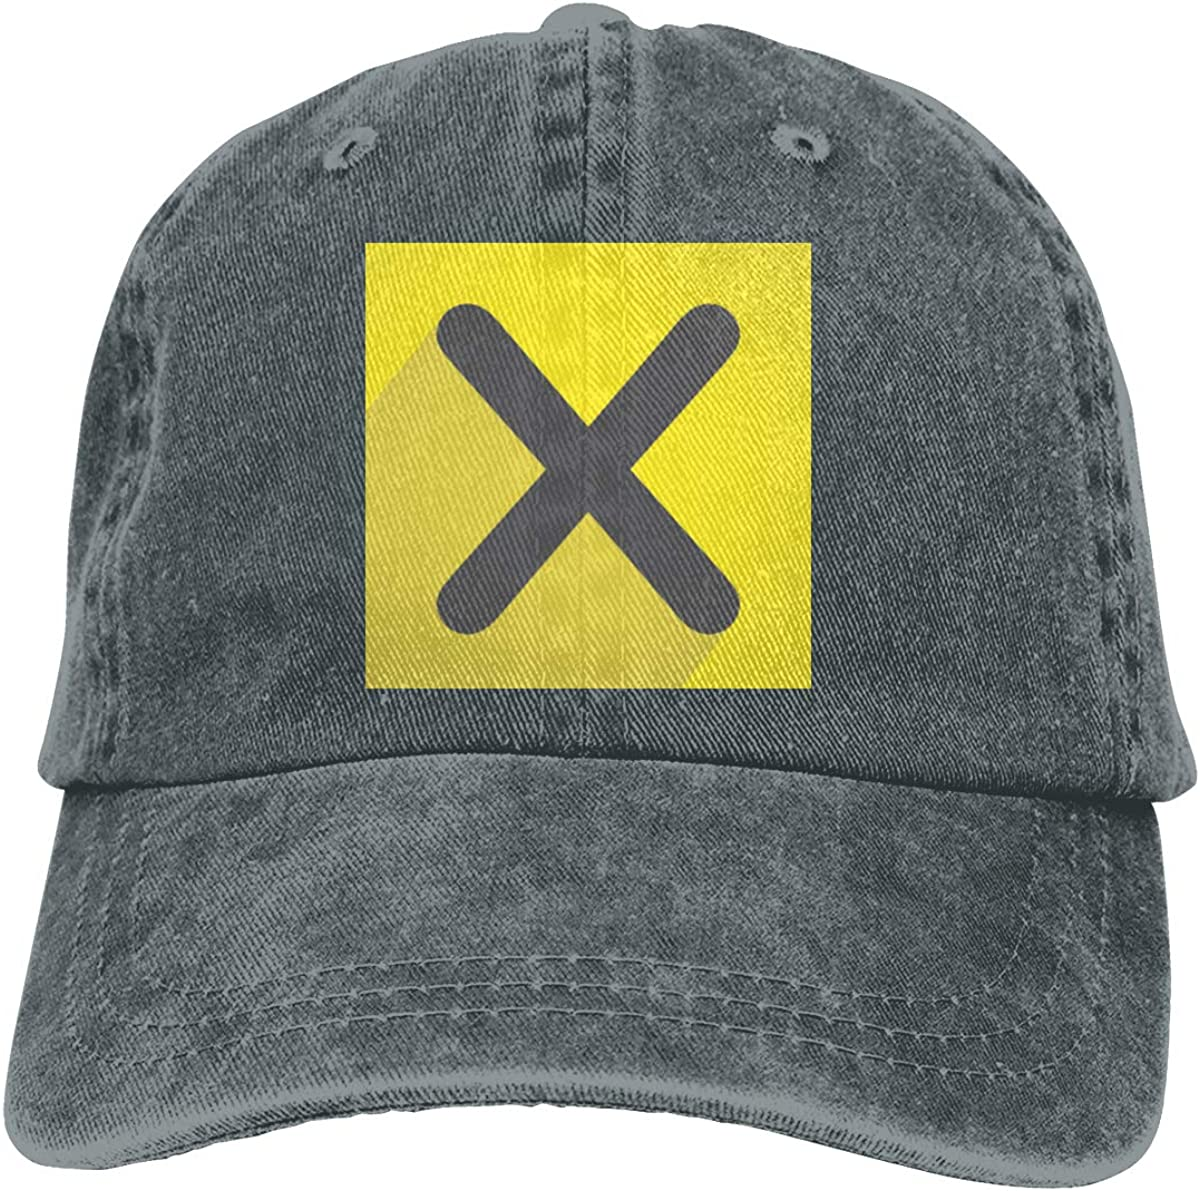 SKFUKS Cowboy Hat Xpress-TV Adjustable Washed Denim Baseball Dad Cap